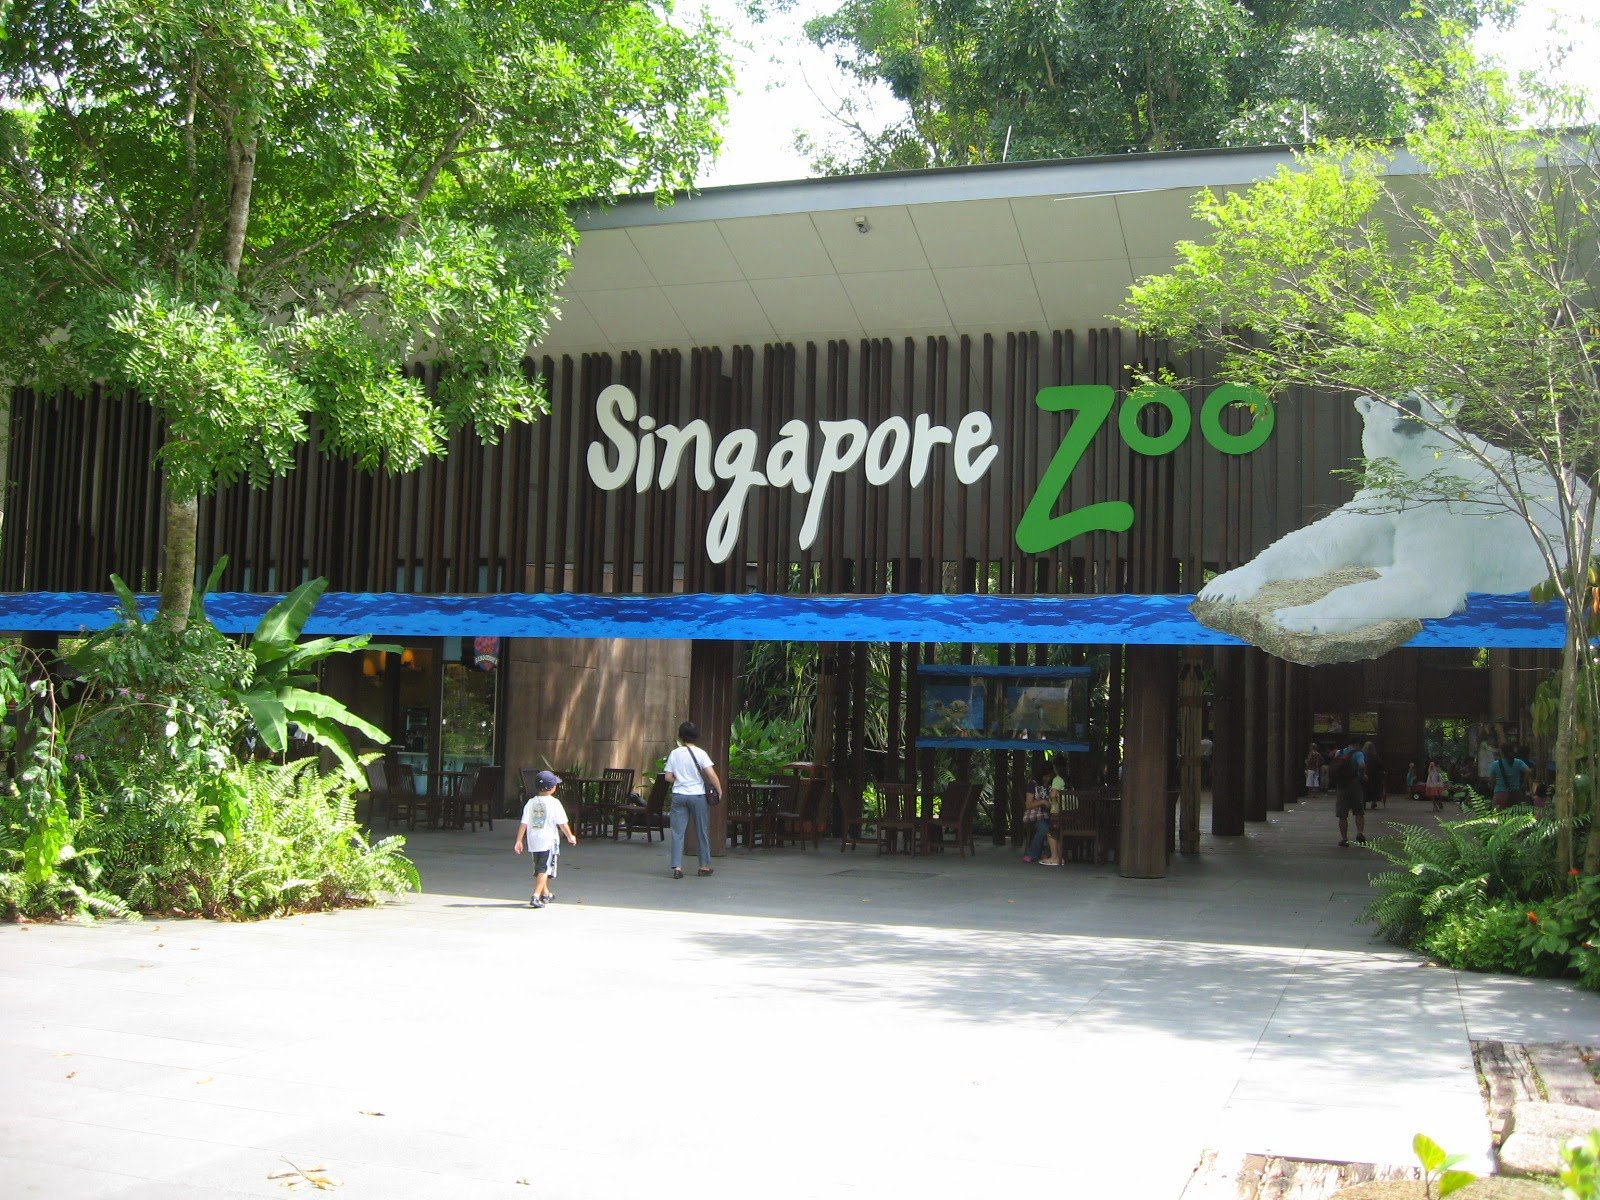 Singapore Zoo                                  Image Source: